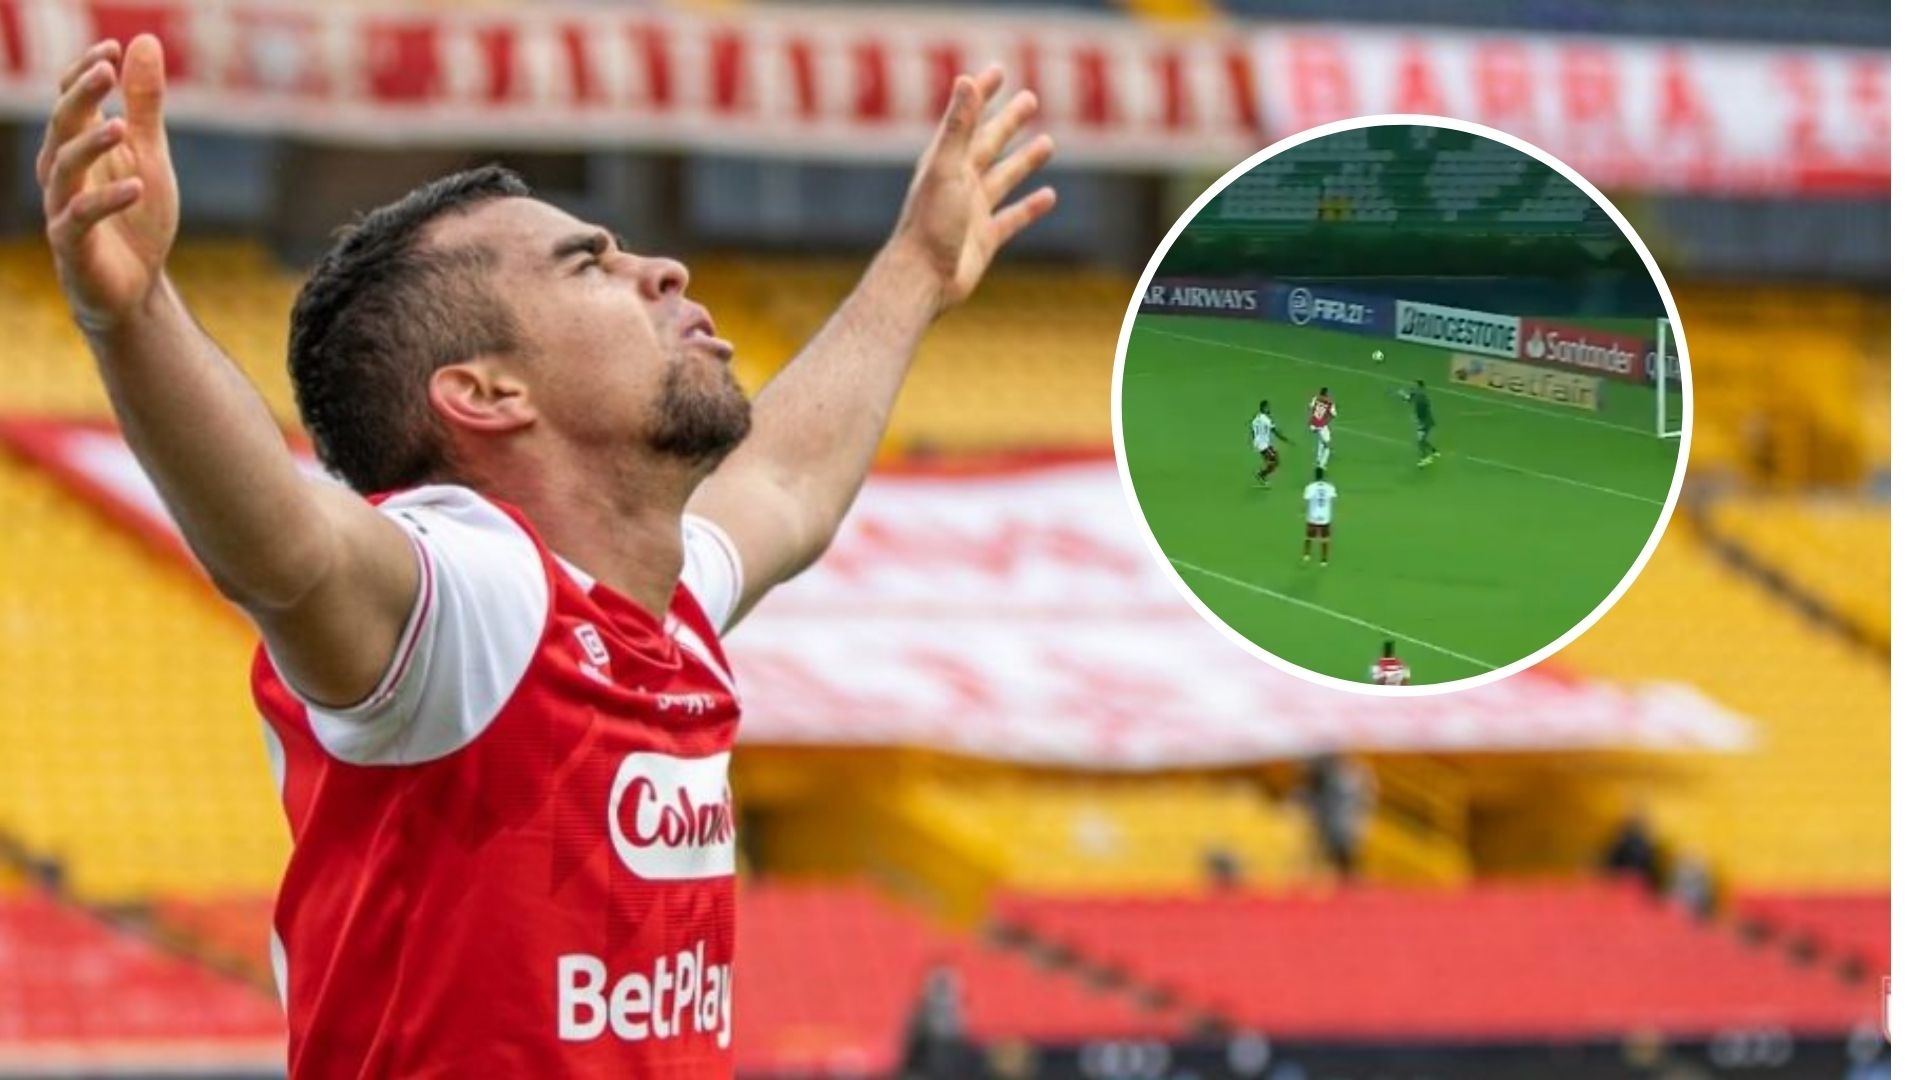 Gol de Daniel Giraldo con Santa Fe vs. Fluminense, entre los mejores de la semana de Libertadores